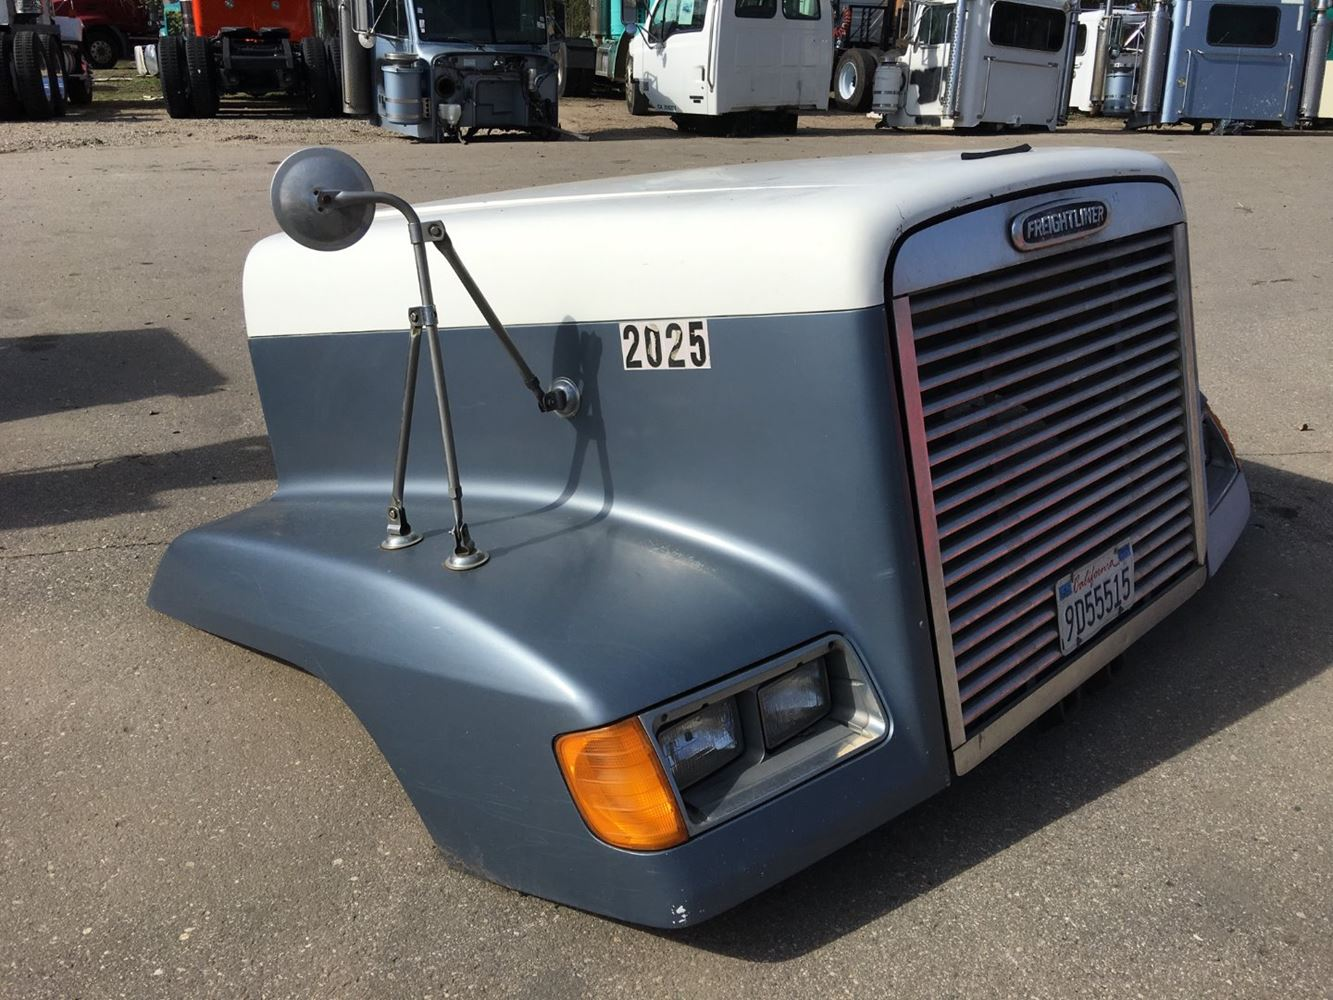 Fld 120 Hood : Freightliner fld stock p hoods tpi